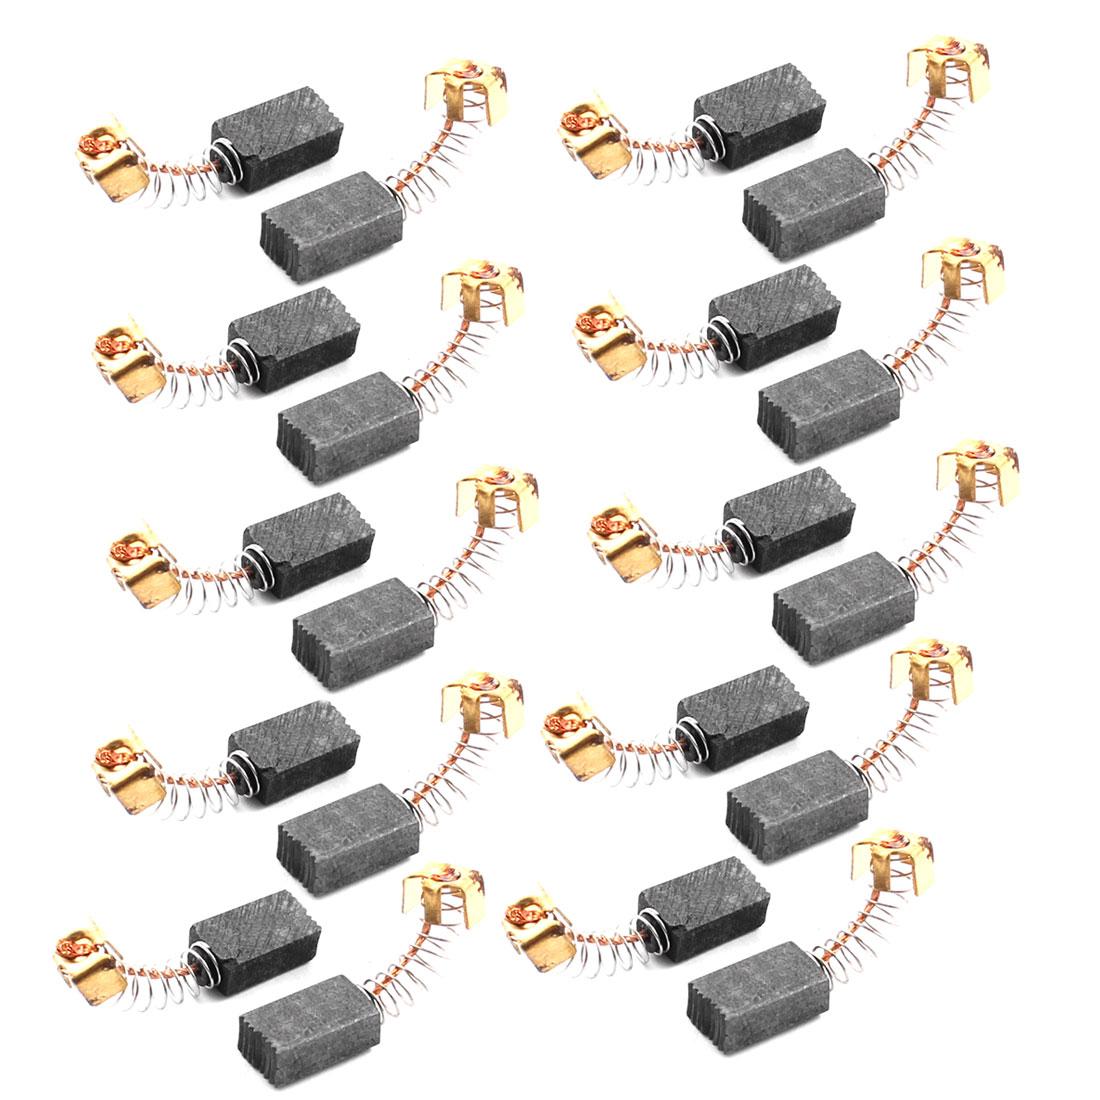 20 Pcs CB64 Electric Tool Spare Part 13mm x 8mm x 5mm Motor Carbon Brush